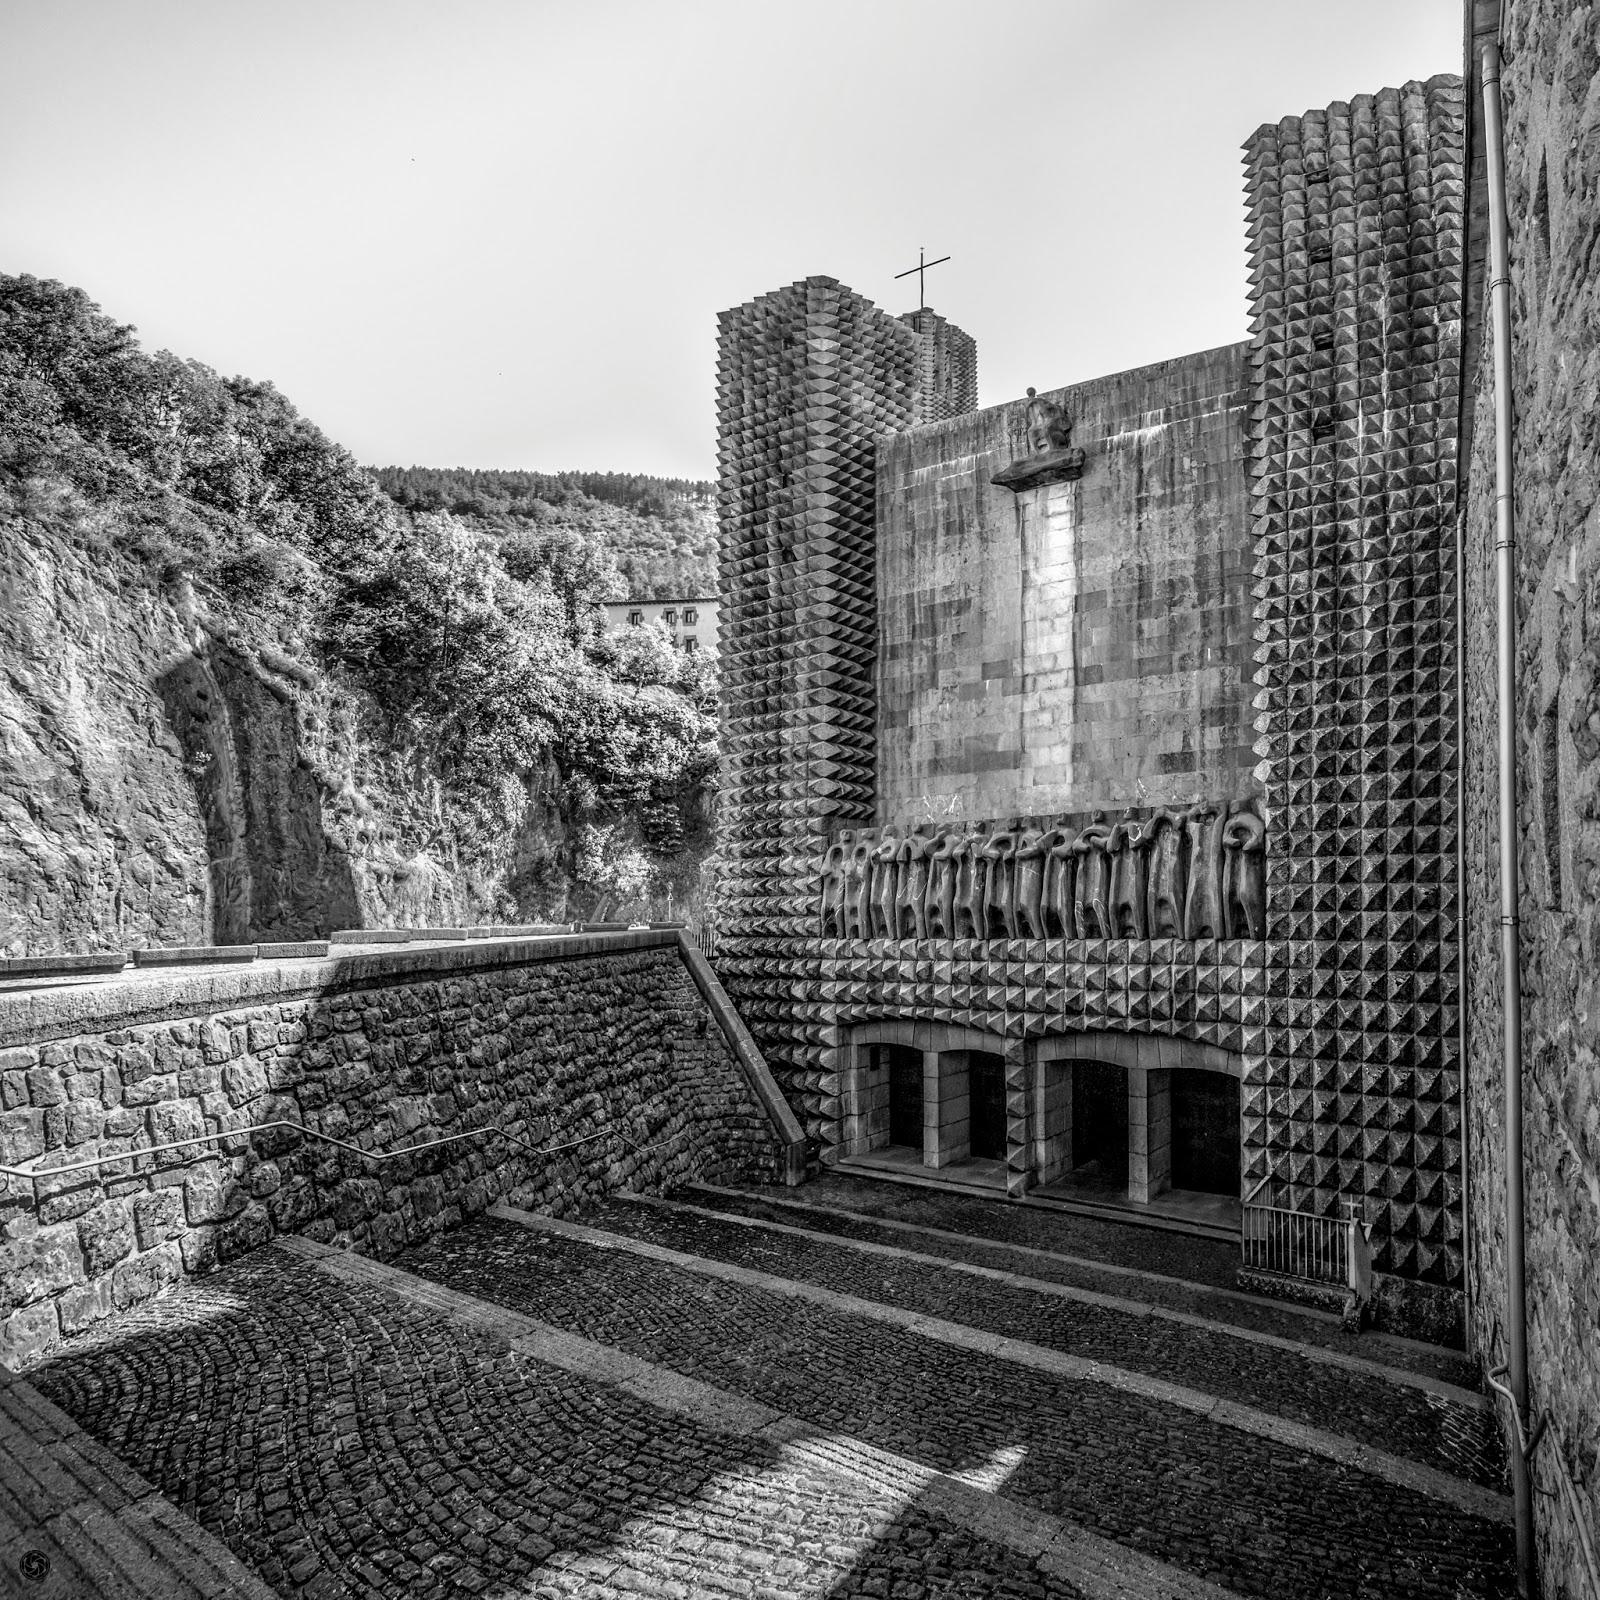 Fachada del Santuario de Arantzazu :: Panorámica 2 x Canon EOS 5D MkIII | ISO400 | Canon 17-40 @17mm | f/8 | 1/400s